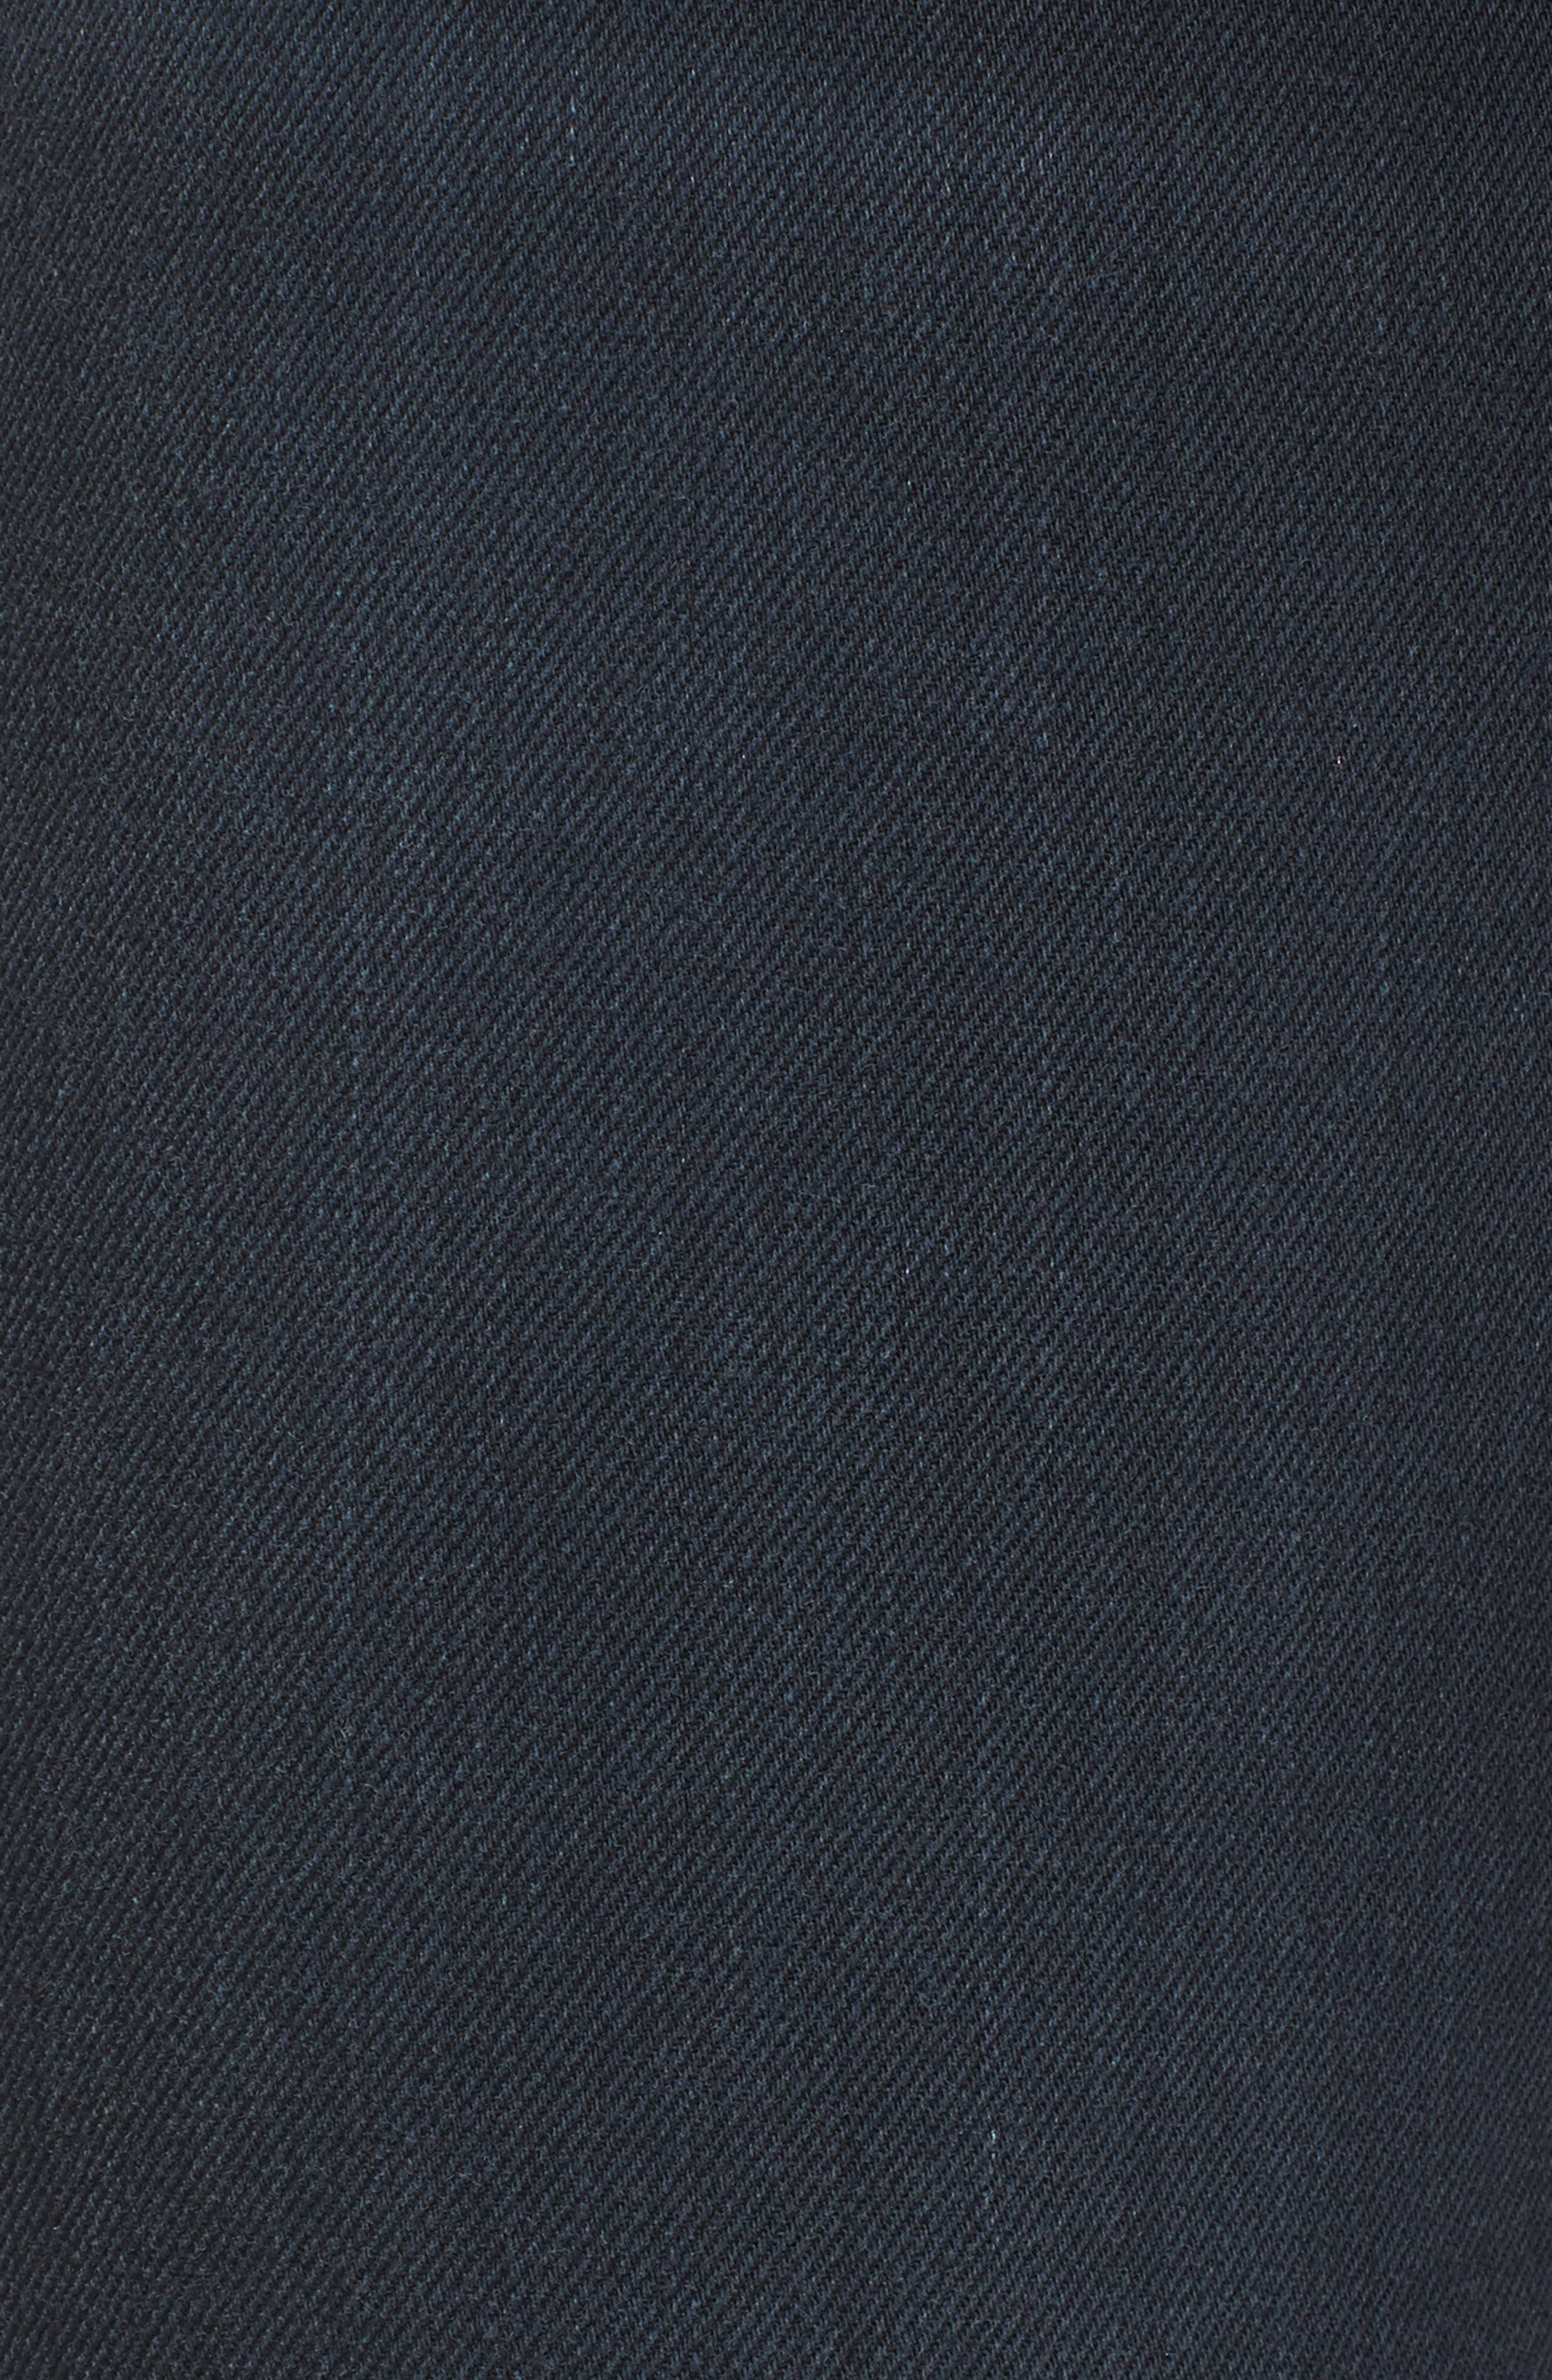 Mia Toothpick Skinny Jeans,                             Alternate thumbnail 5, color,                             071